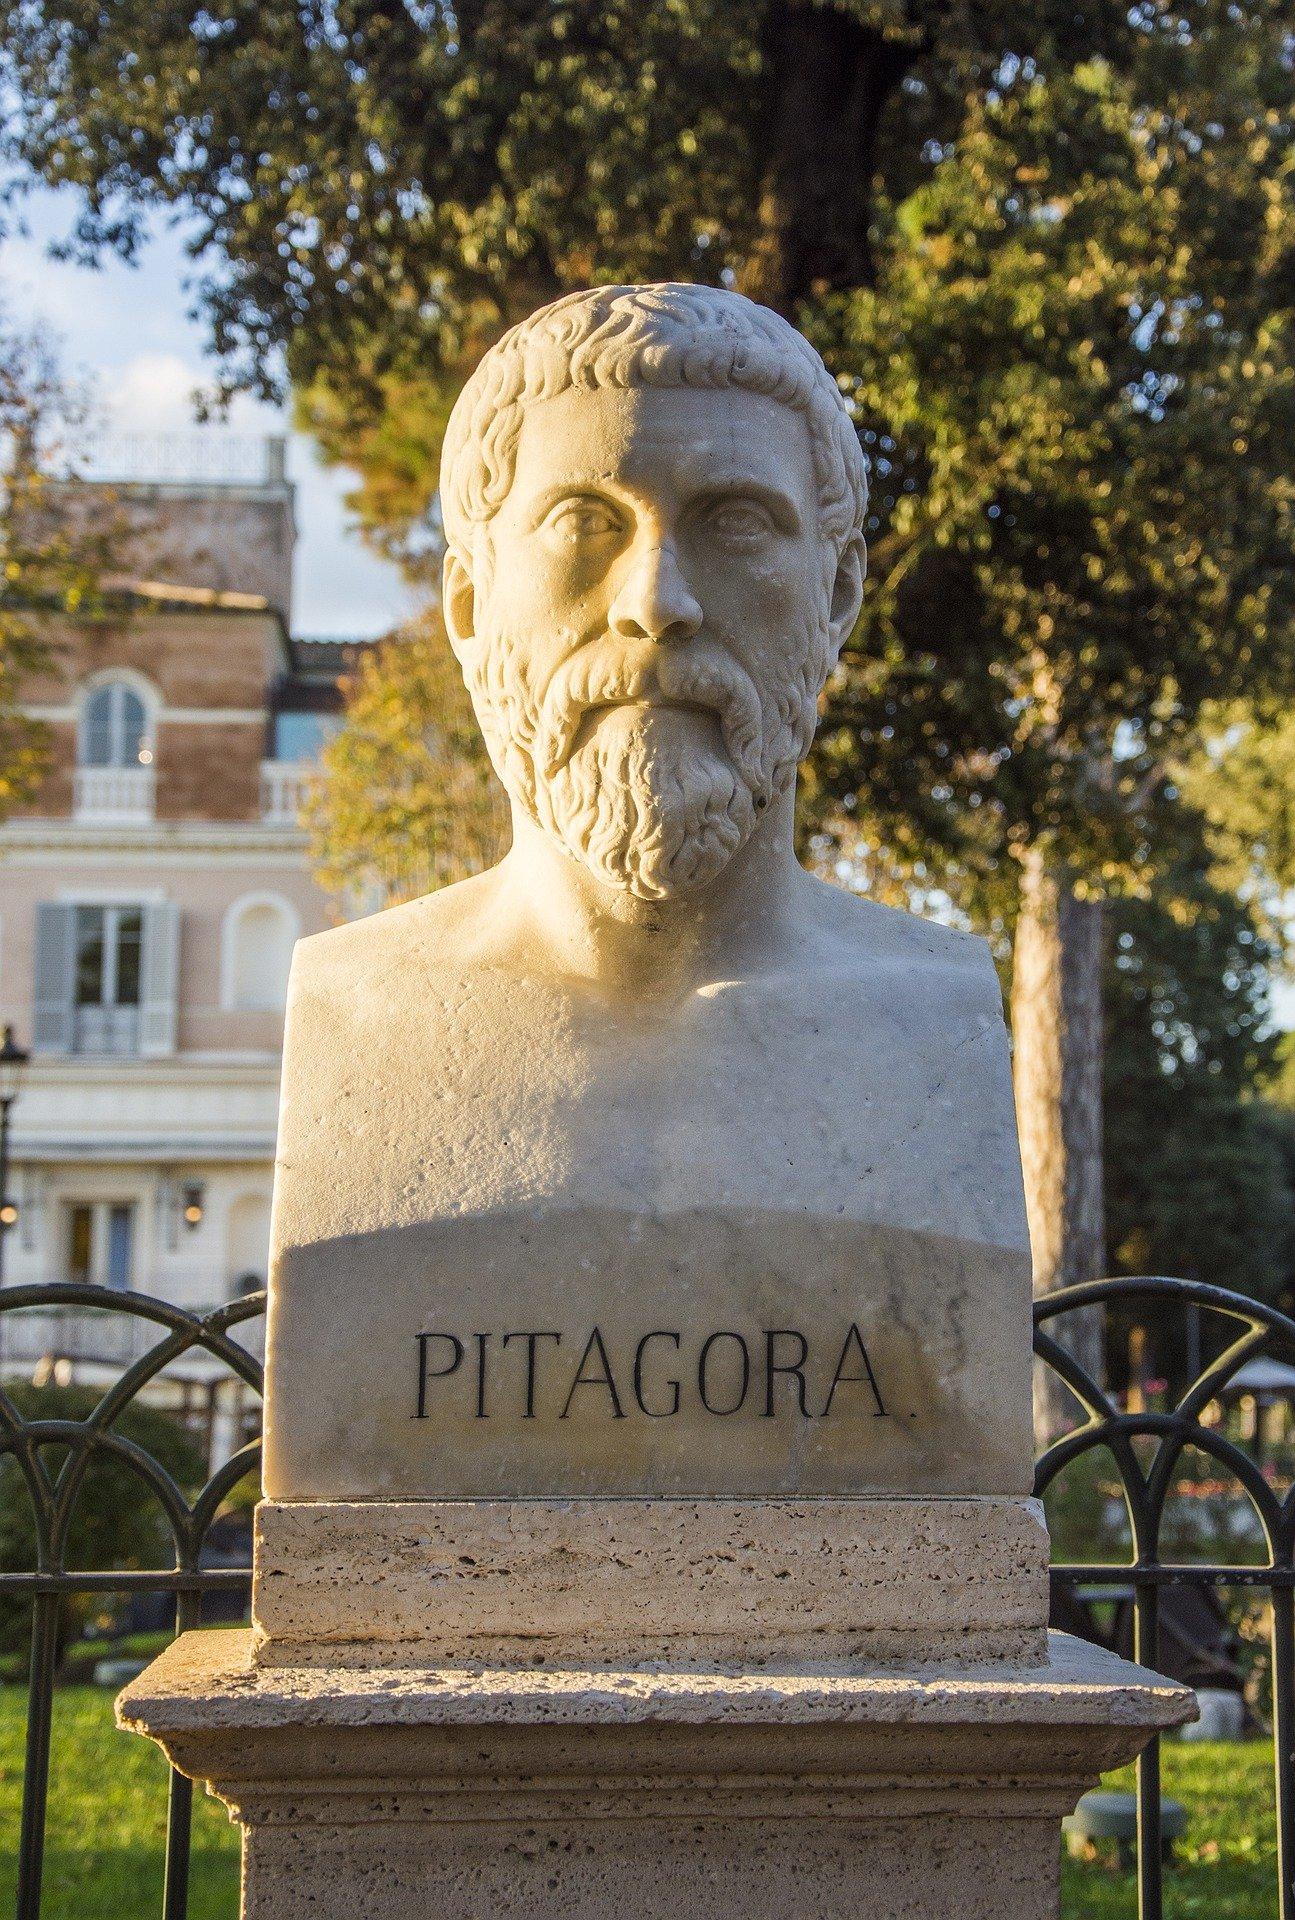 pitagora 4670070 1920 1